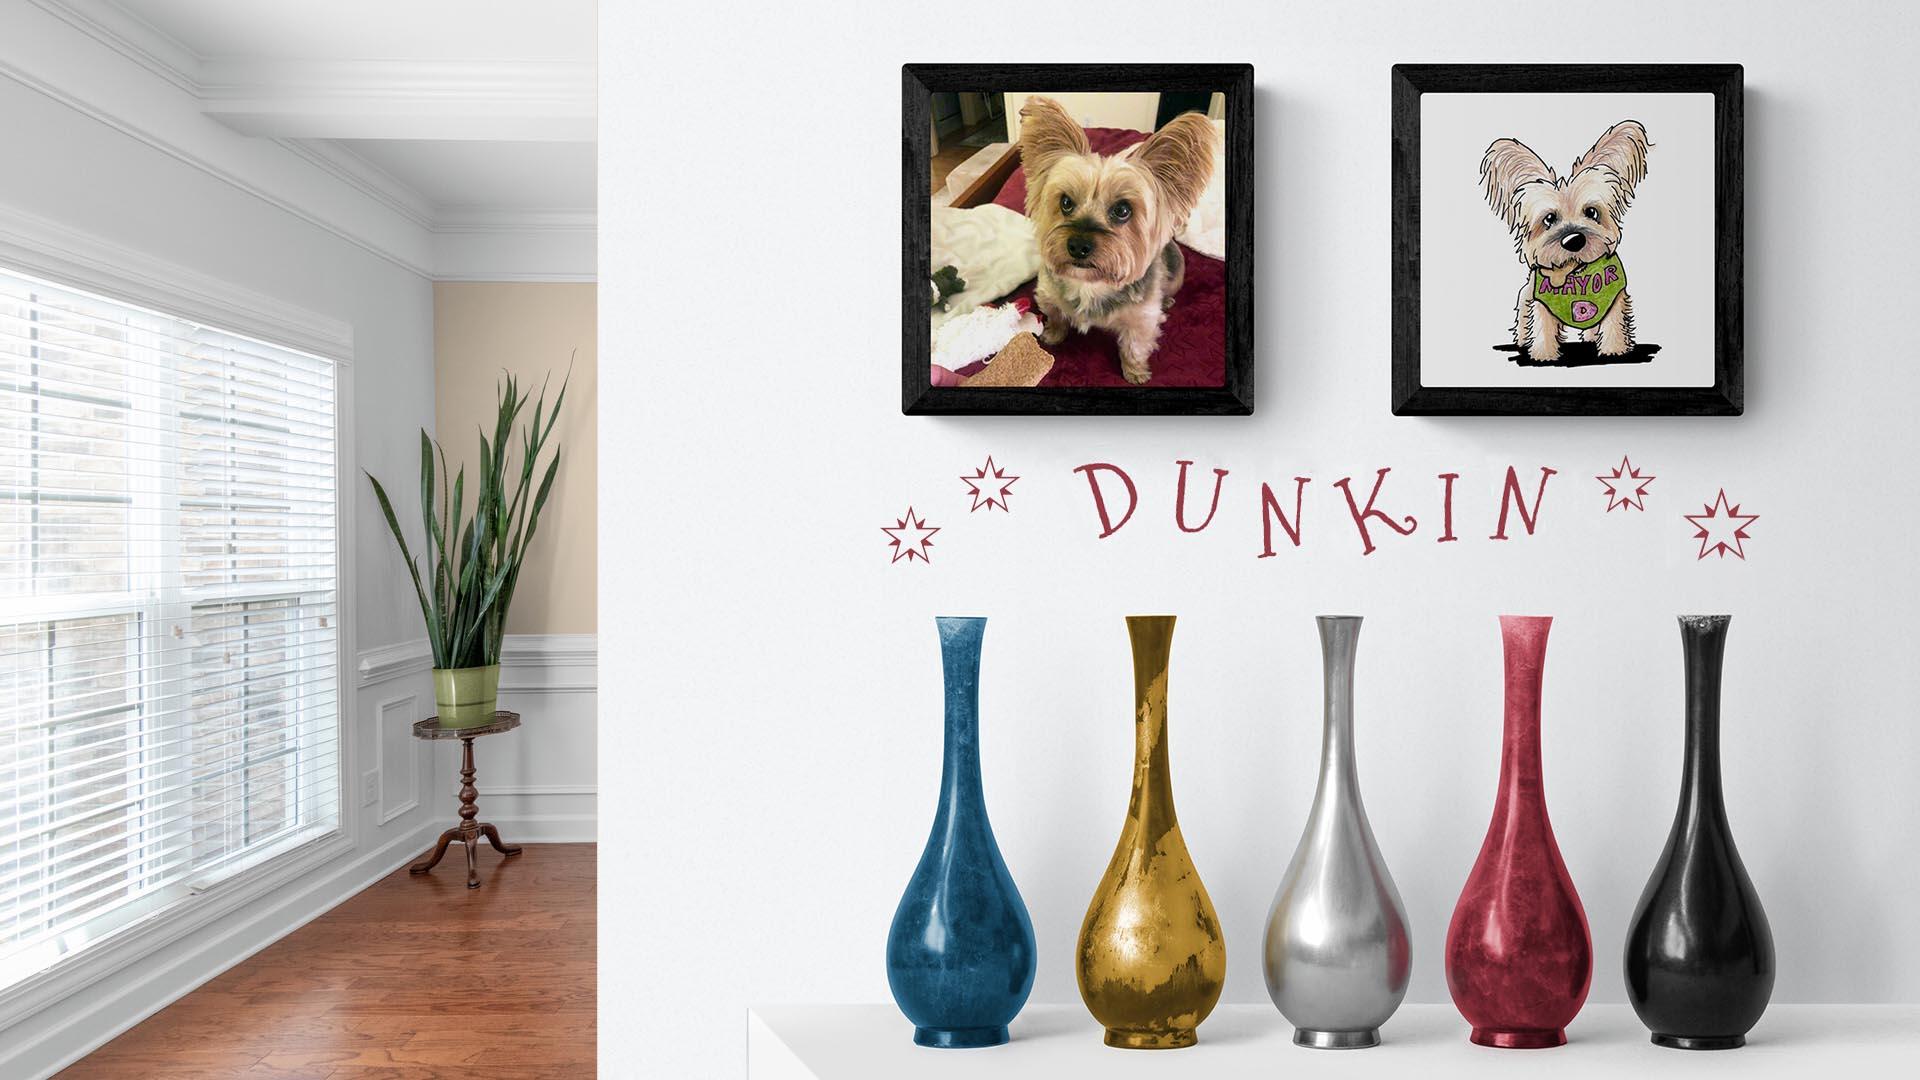 Dunkin's Portrait